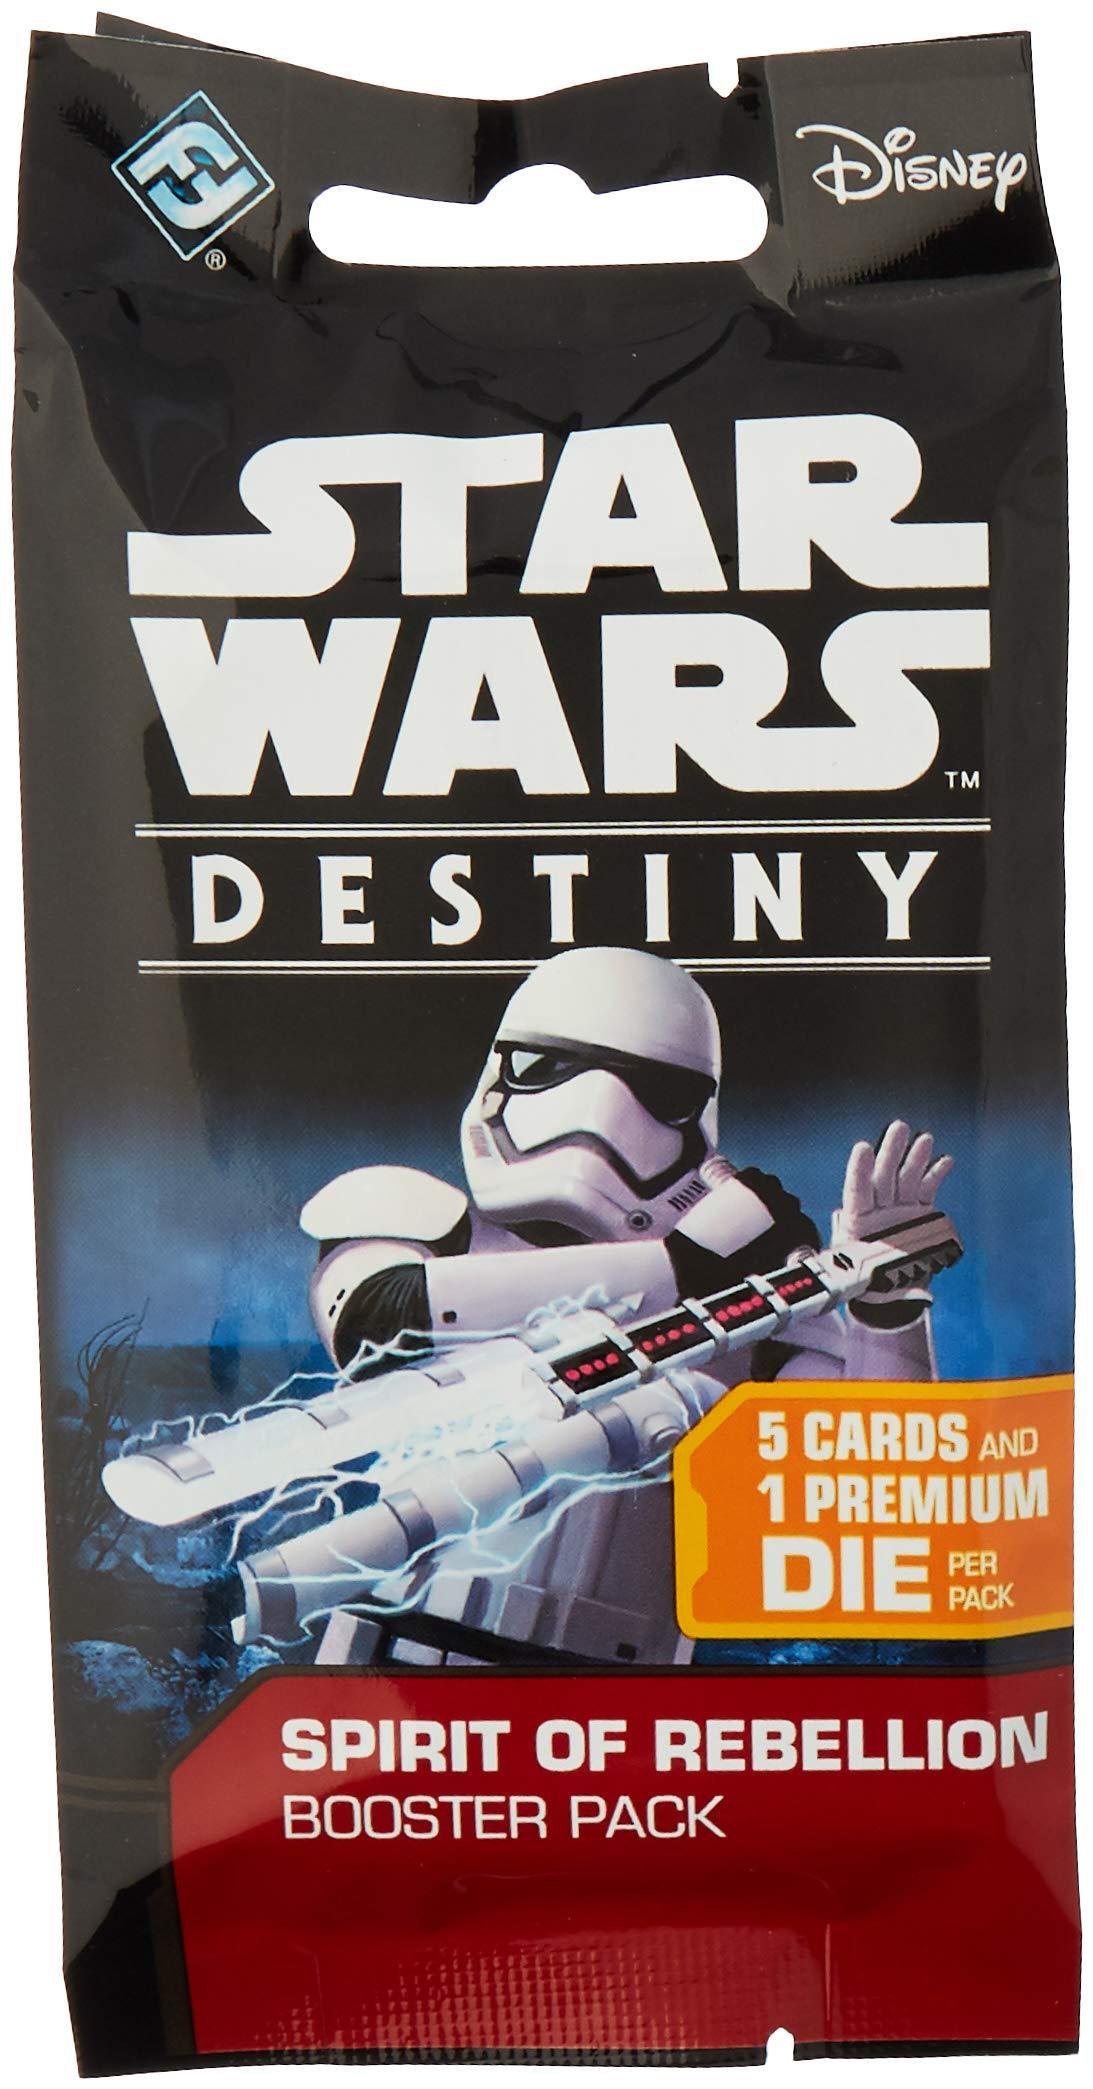 Star Wars Destiny TCG: Spirit Of Rebellion [Dice & Cards] - Booster Box (36 Booster Packs)